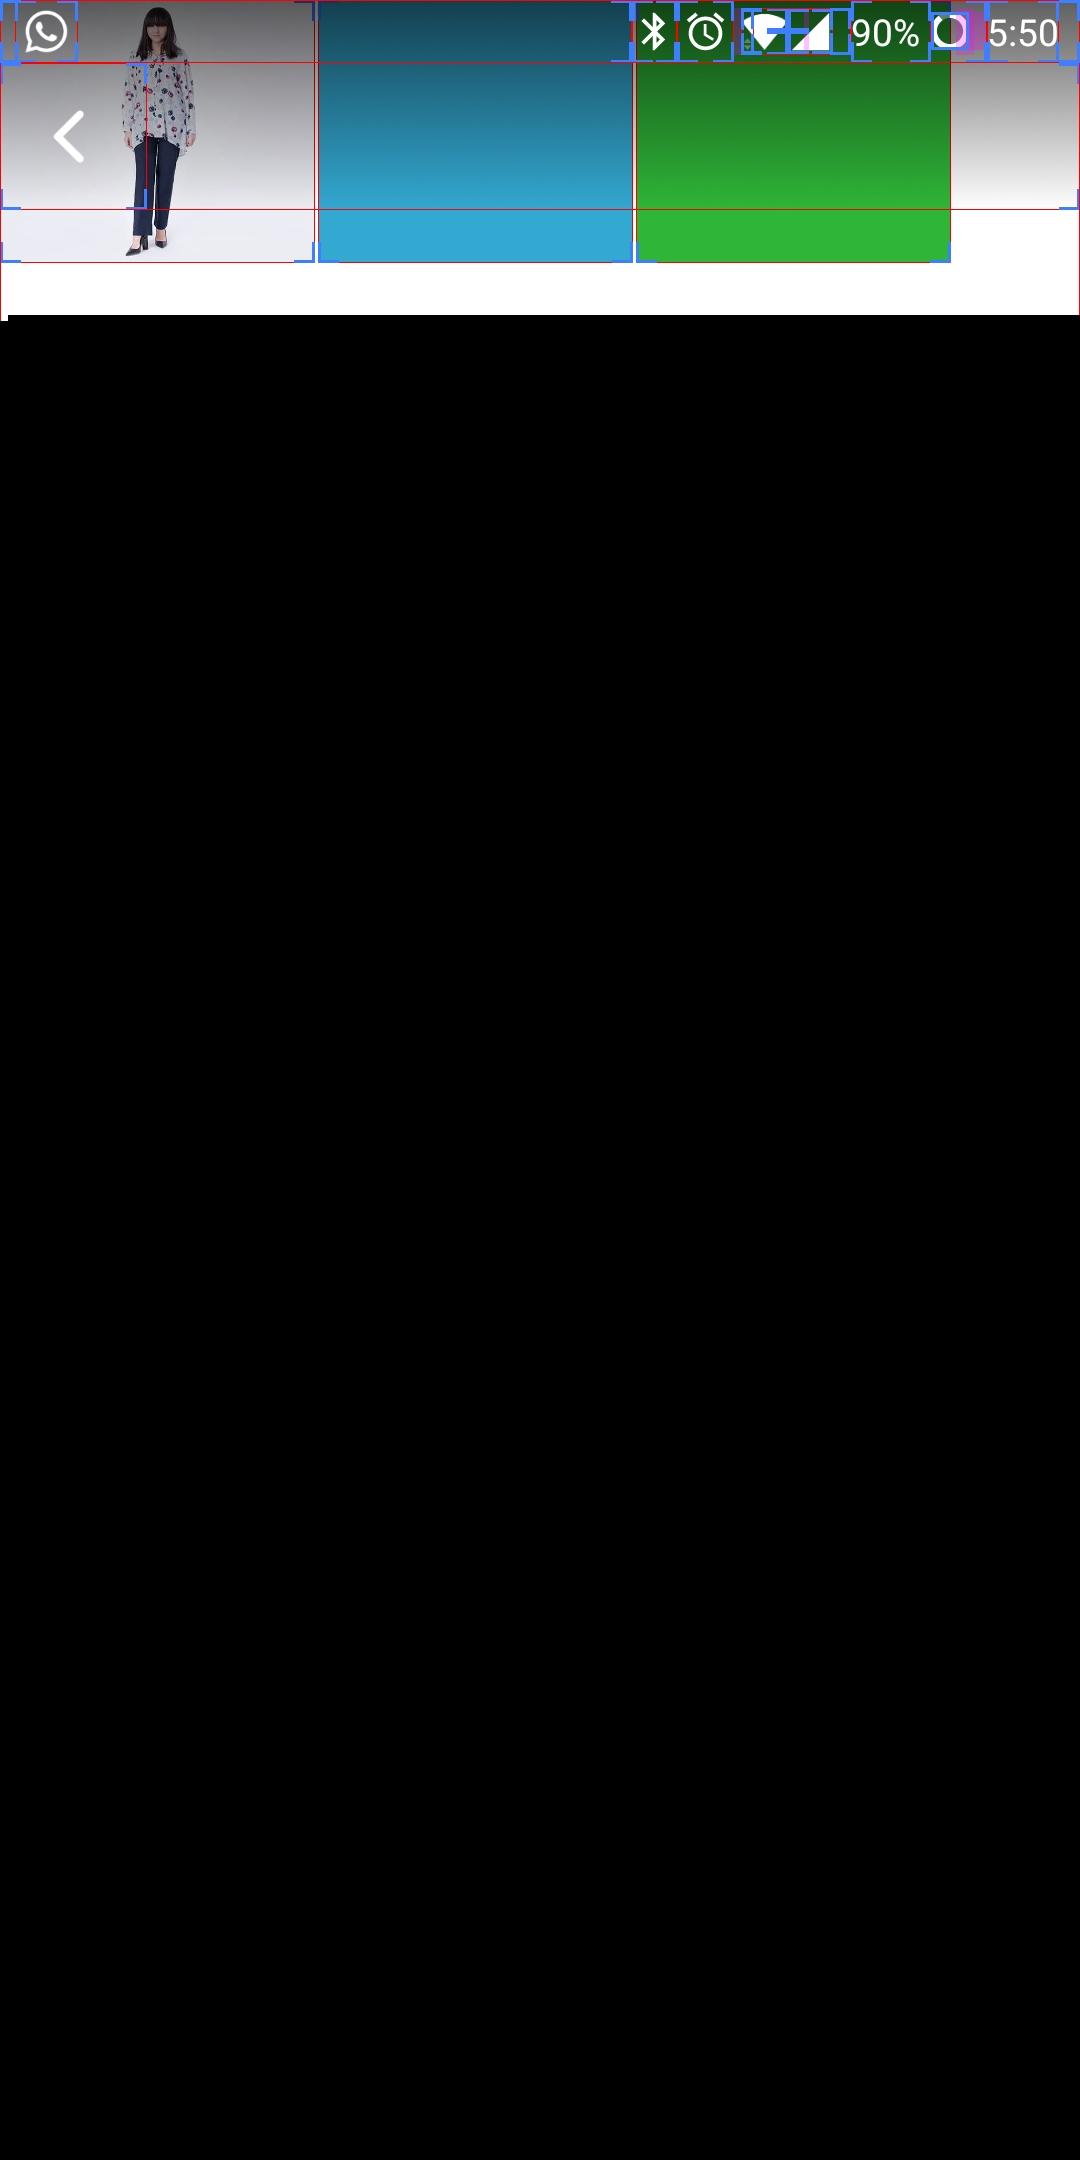 Android 的Flexbox布局 - Android开发 - 评论   CTOLib码库